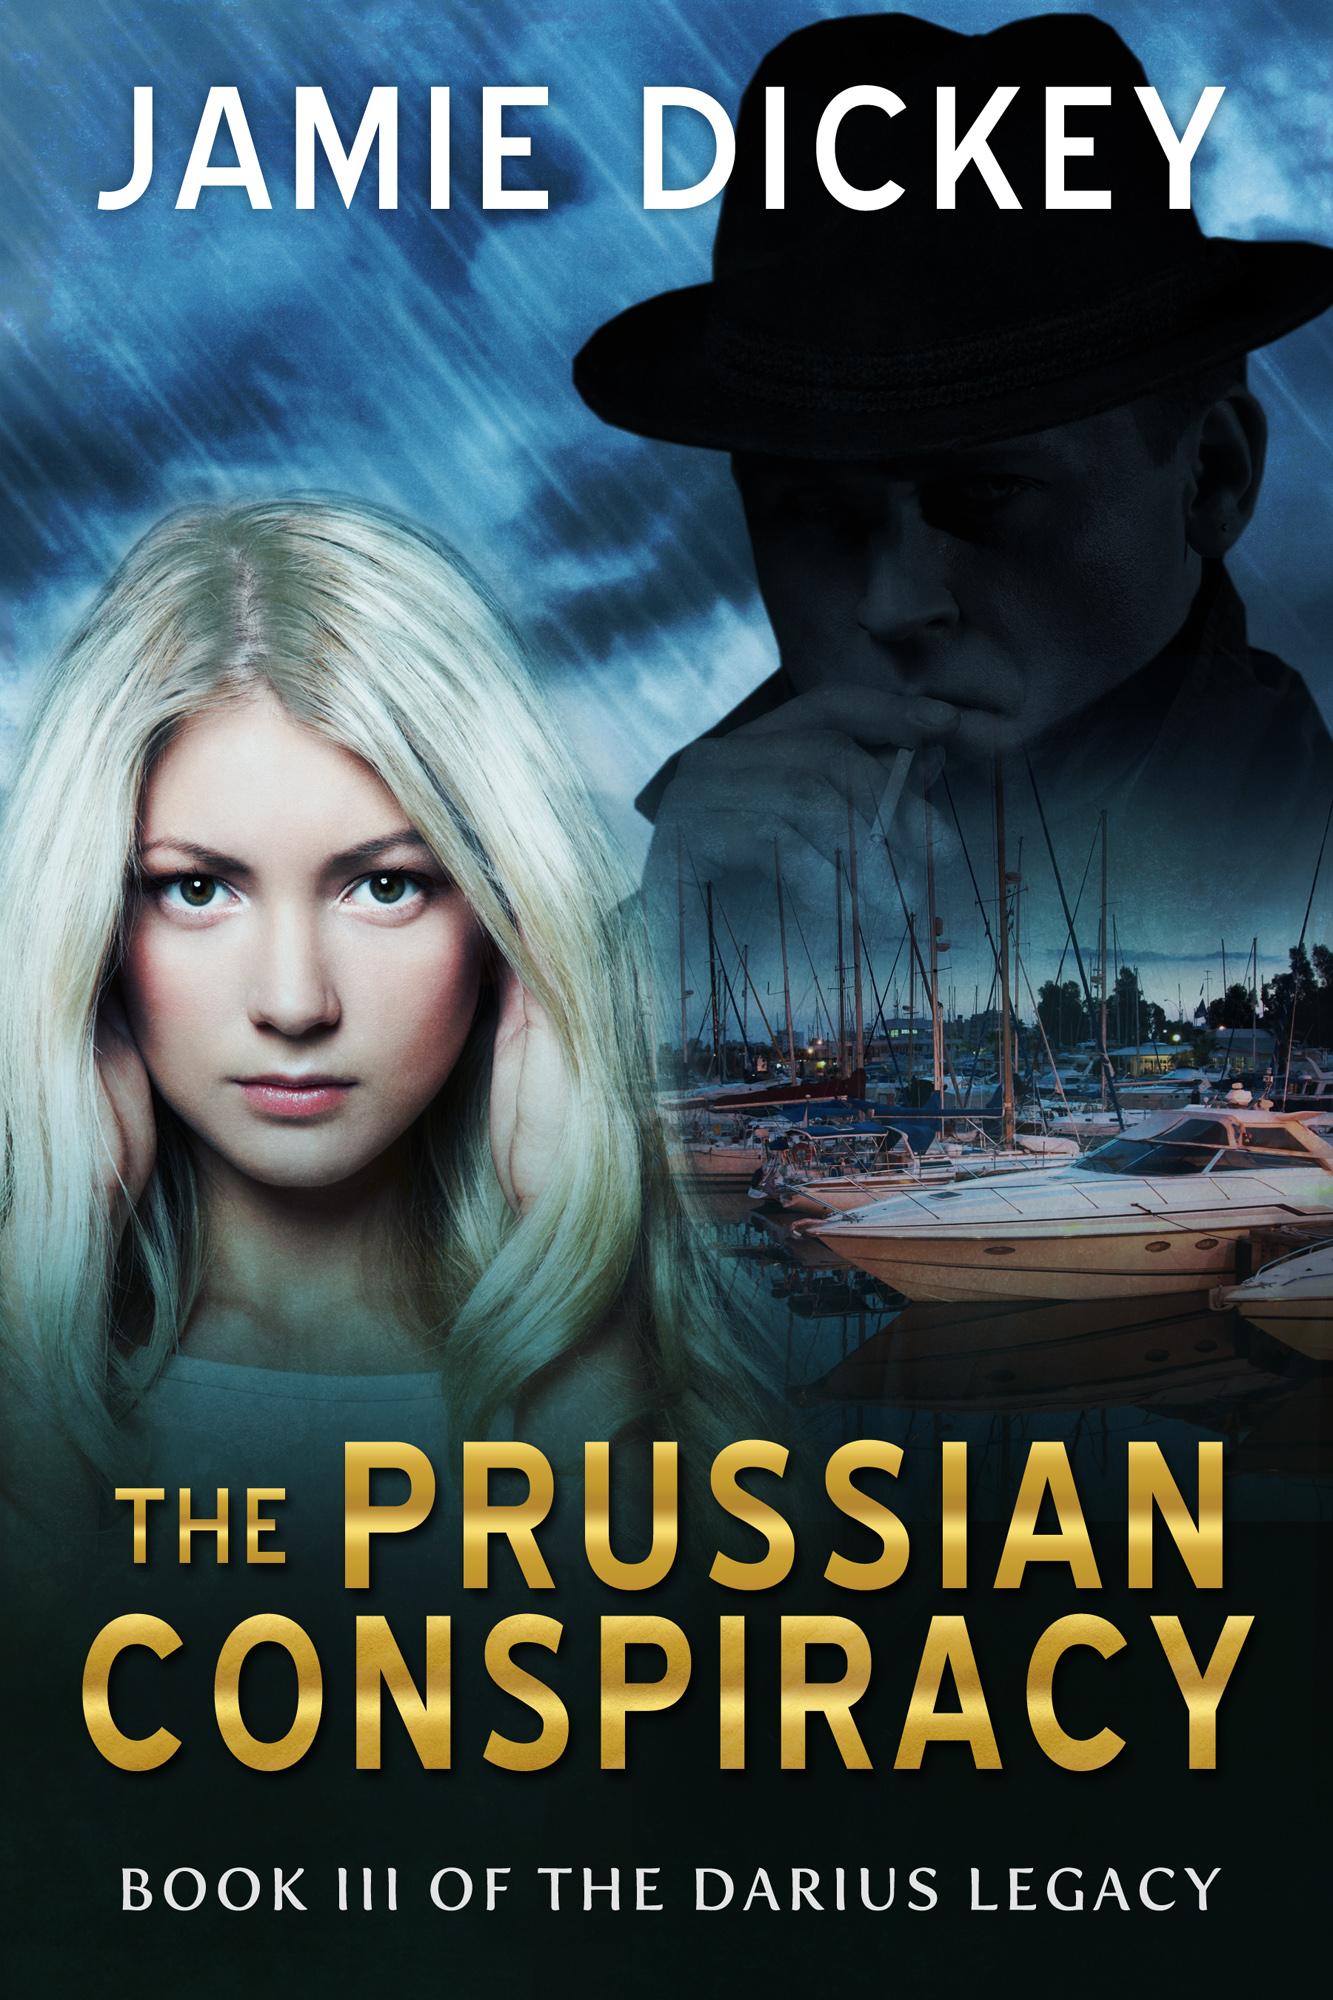 The Prussian Conspiracy_ebook-1333x2000.jpg